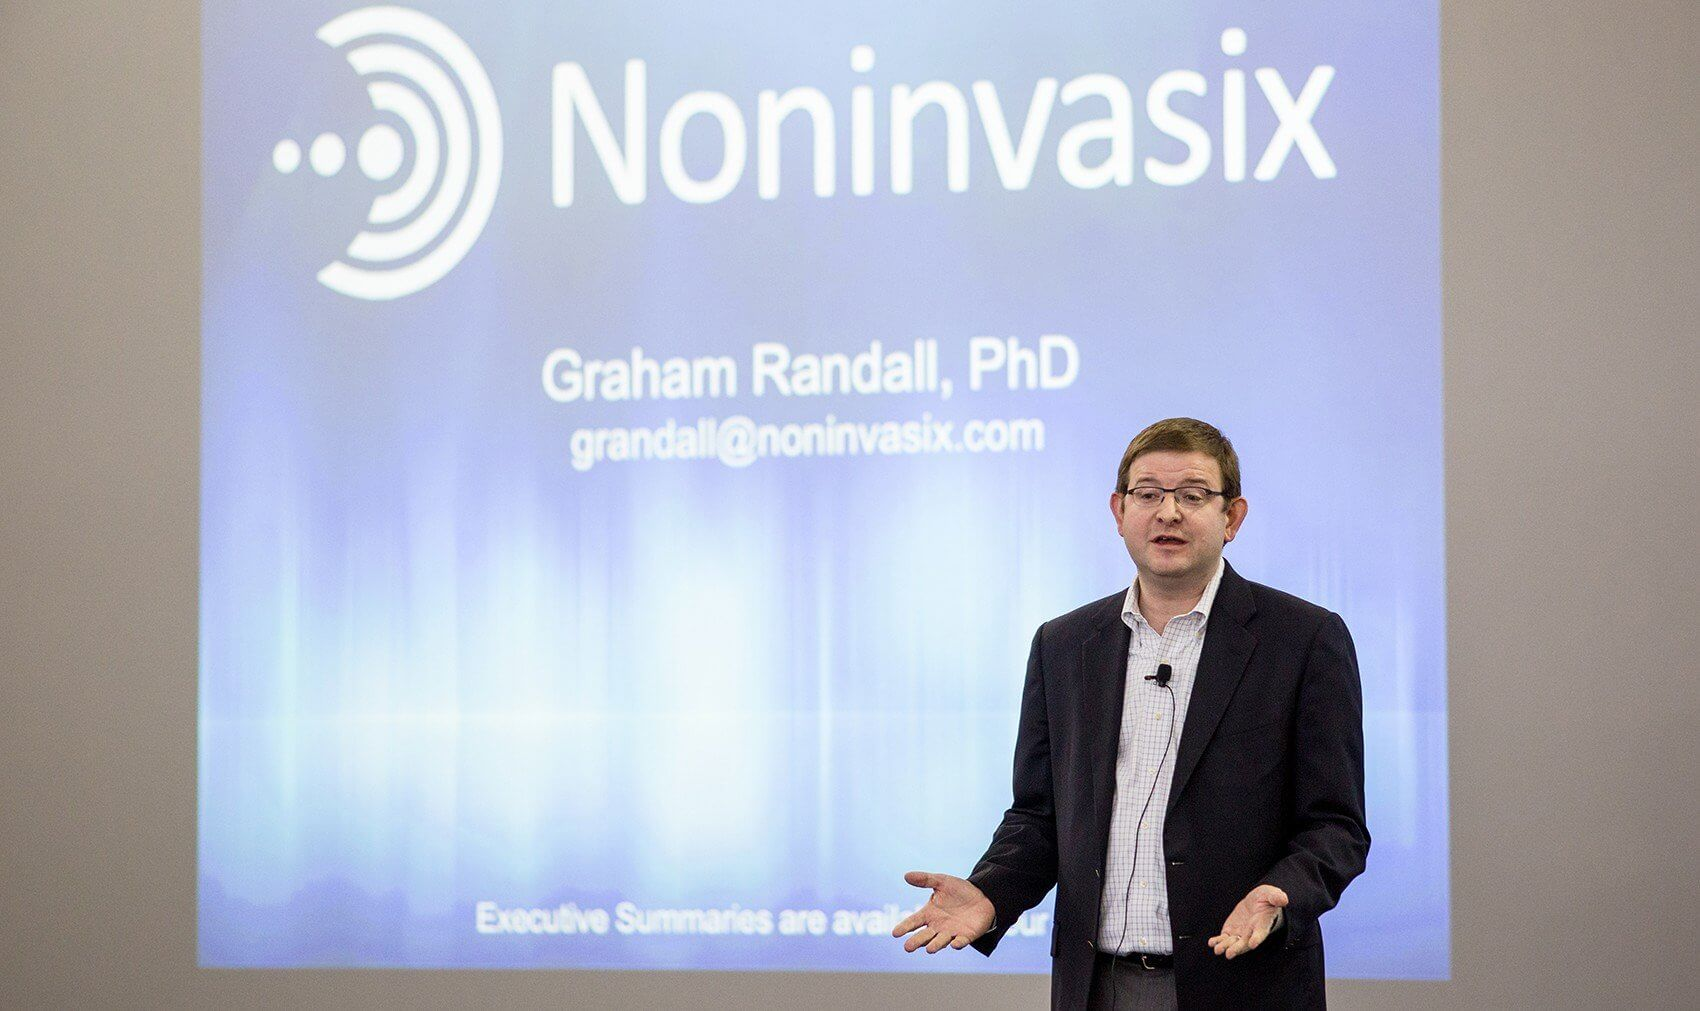 Graham Randall, chief executive officer of Noninvasix.